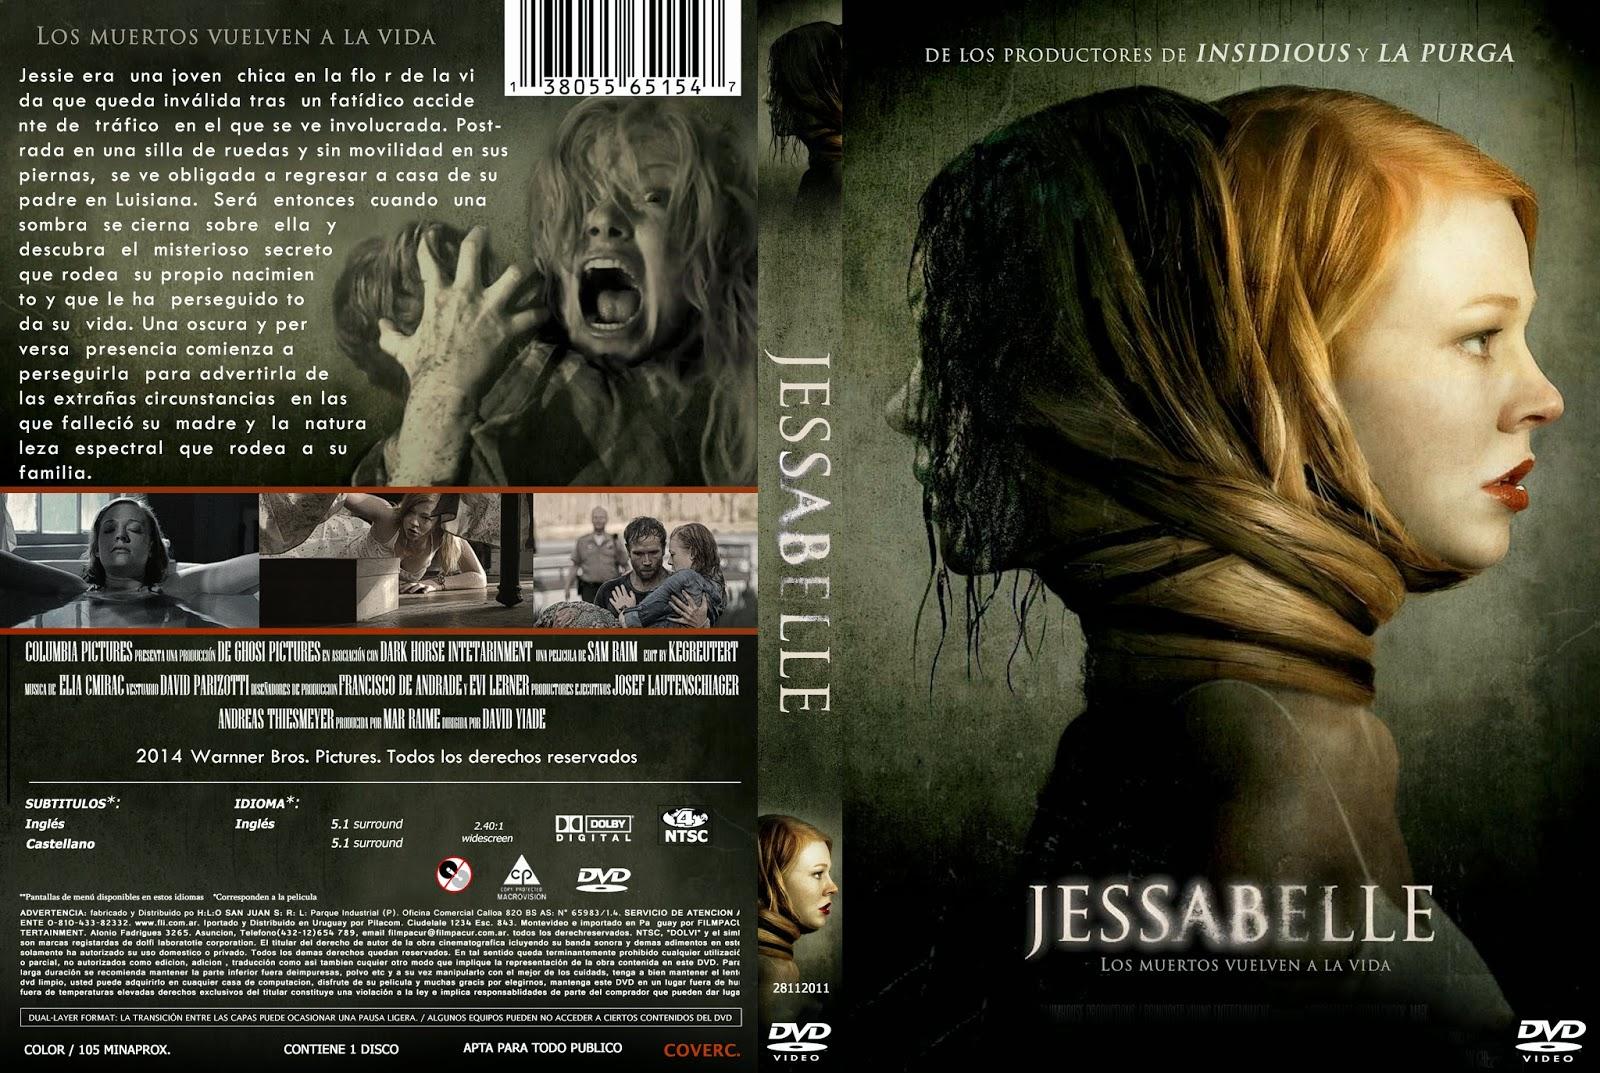 Baixar Jessabelle O Passado Nunca Morre DVD-R Jessabelle 2BCOVERCREATORS